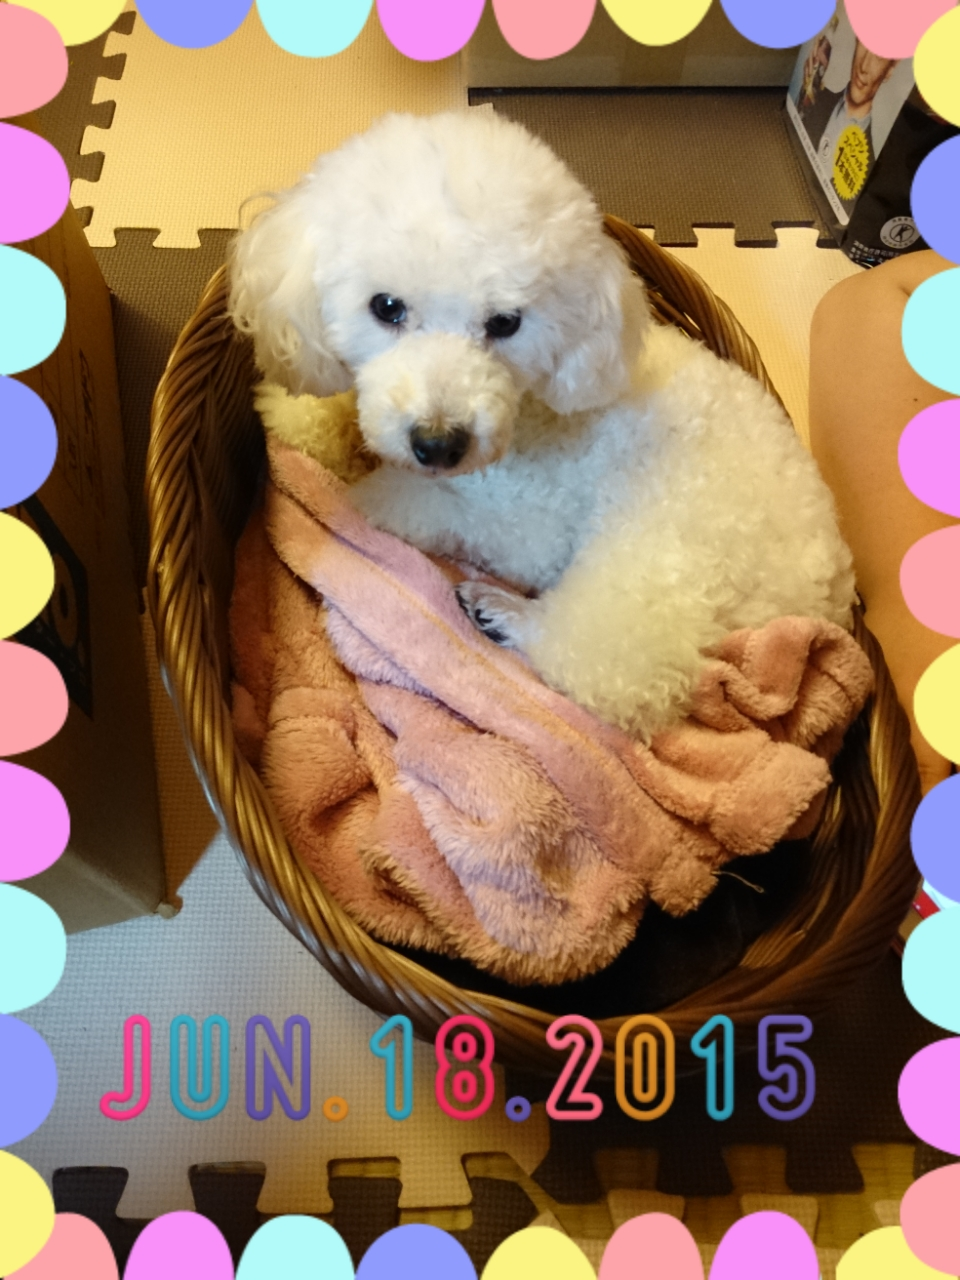 2015-06-18-18-47-26_deco.jpg